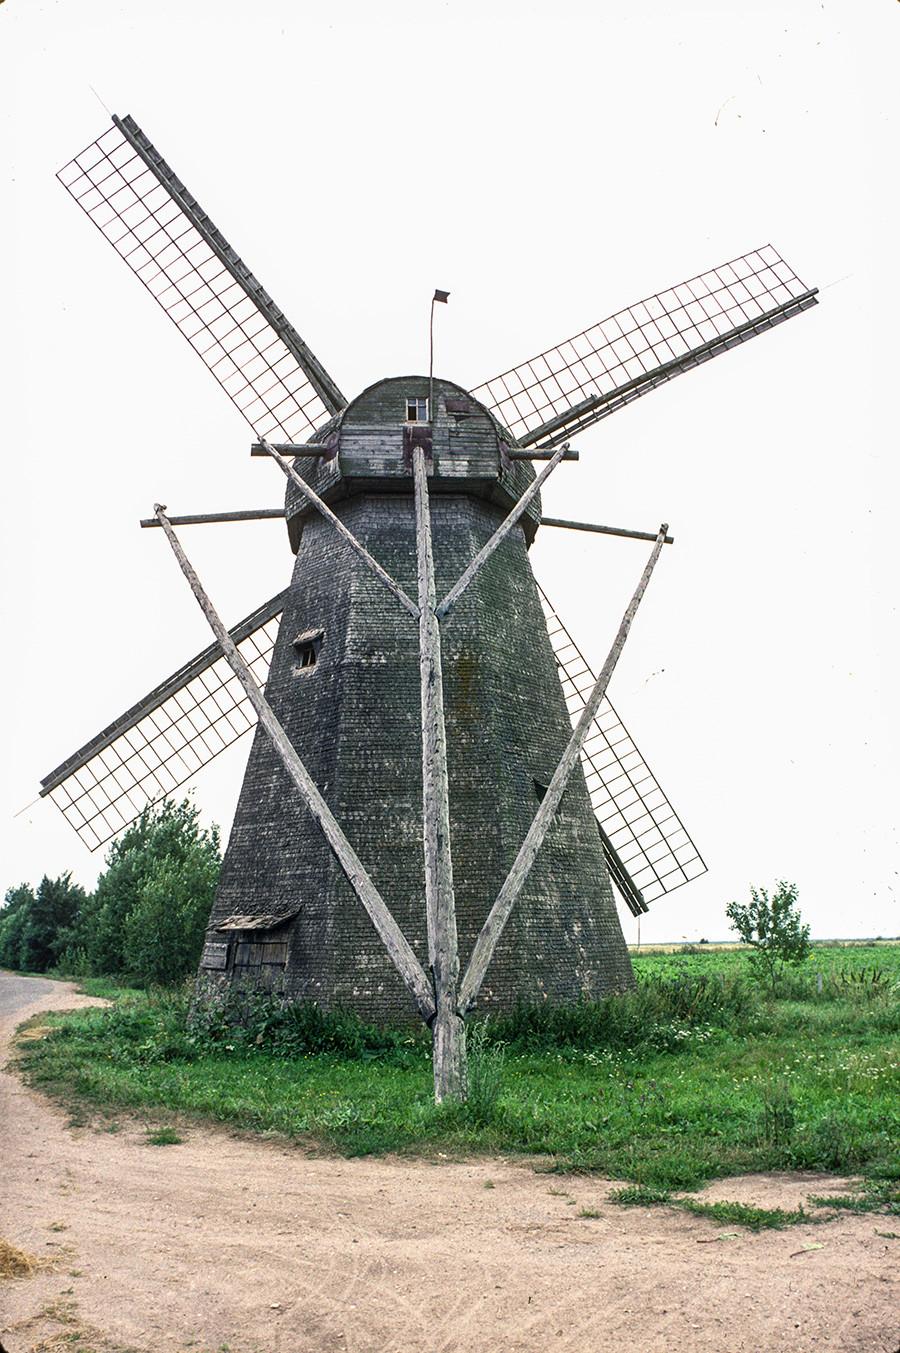 Seltso (Novgorod Region). Tower windmill, back view. August 11, 1994